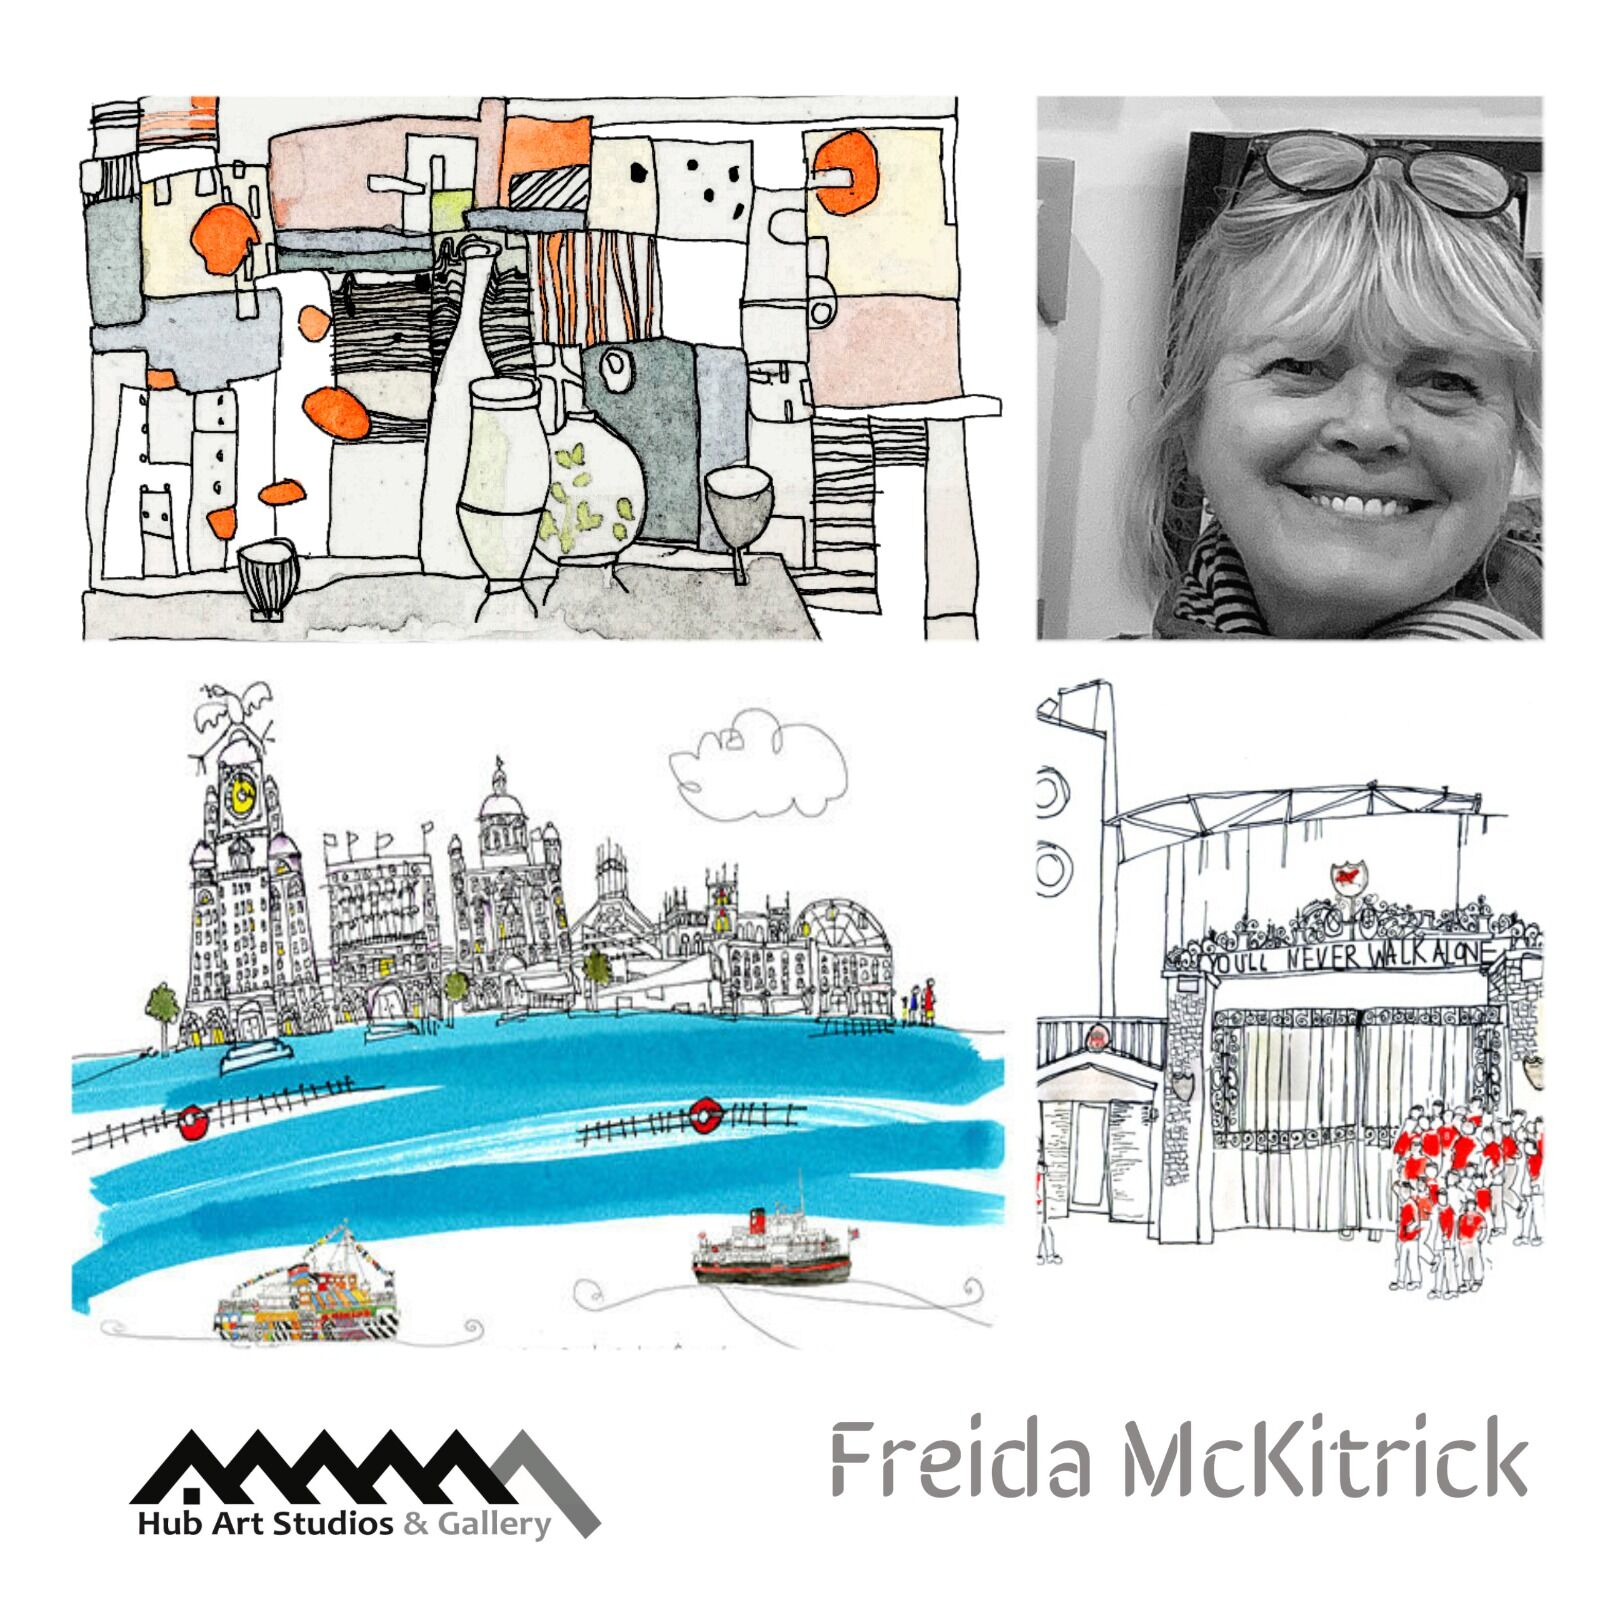 Freida McKitrick